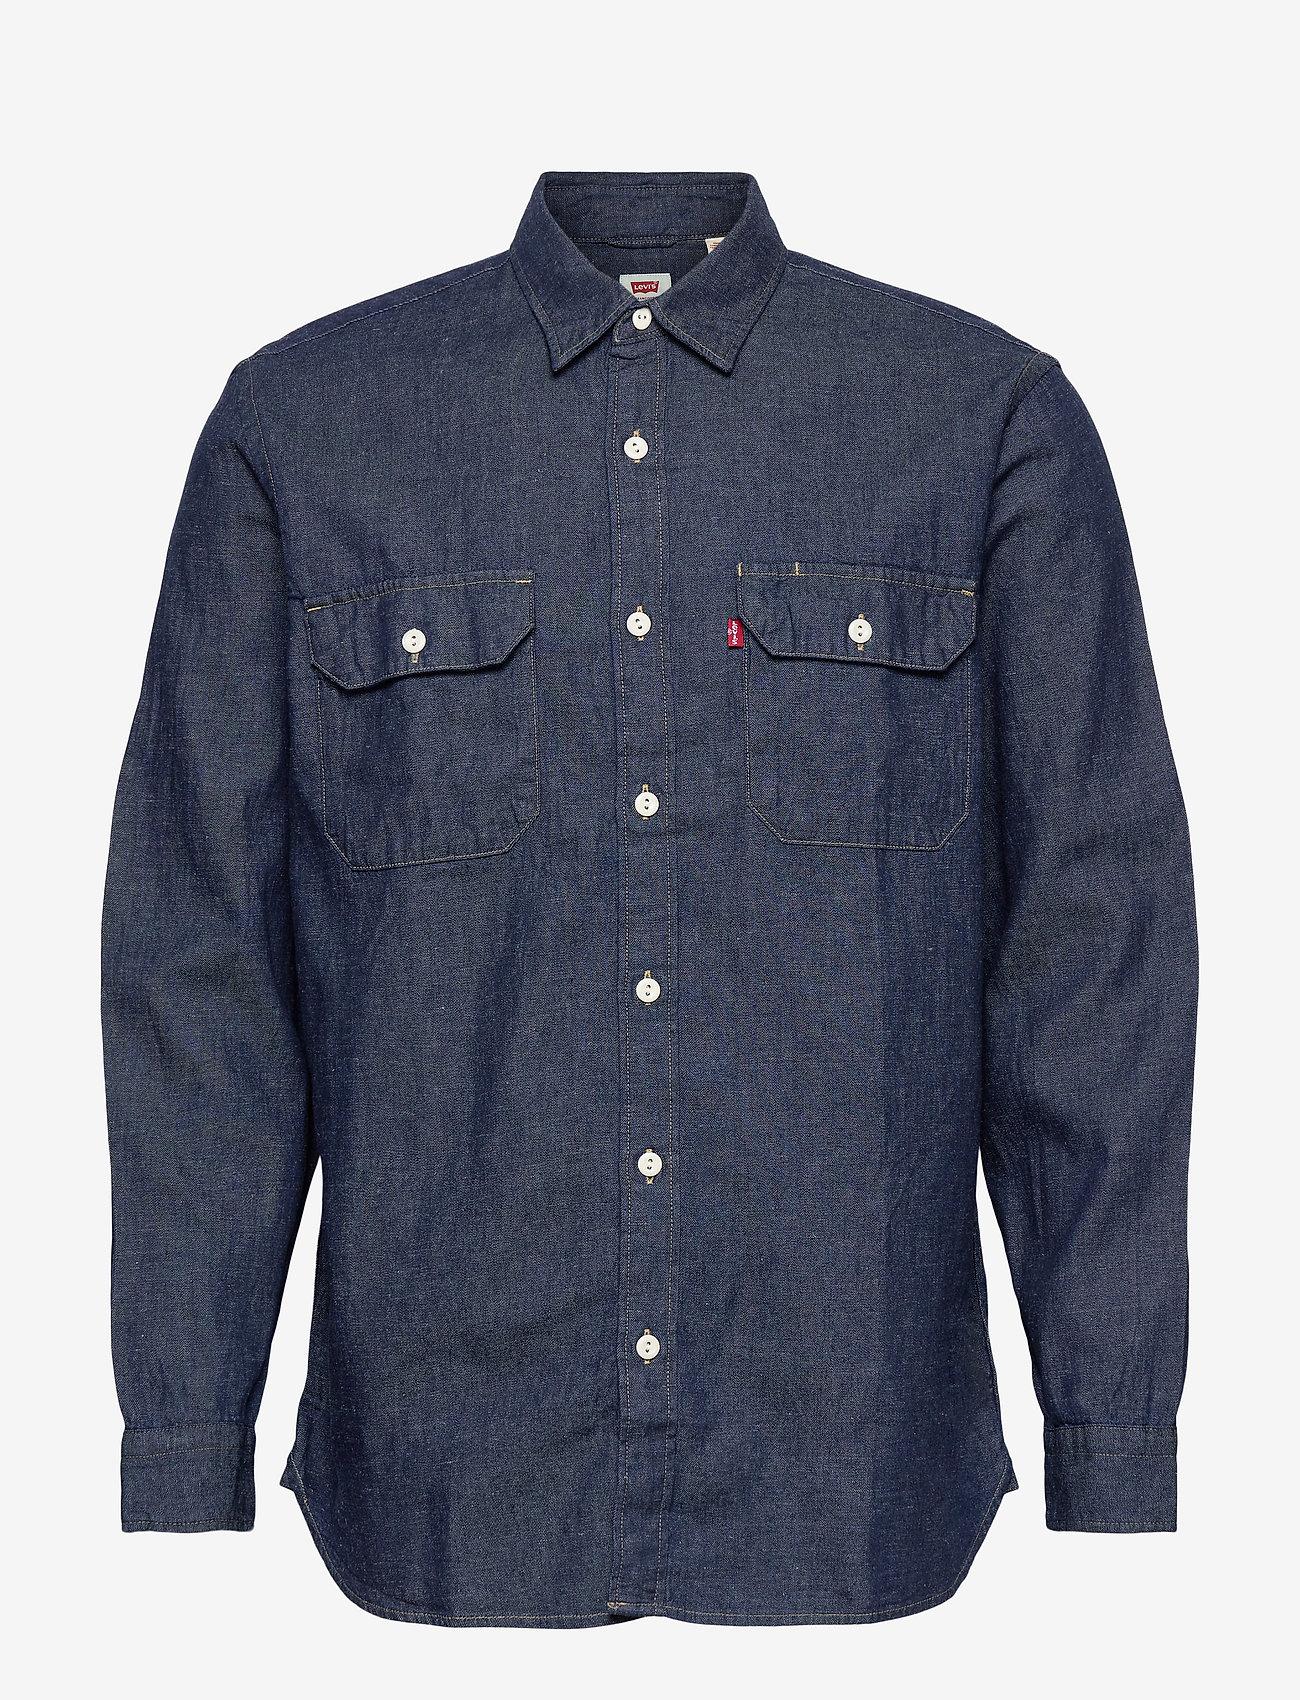 LEVI´S Men - JACKSON WORKER LT WT COTTON HE - checkered shirts - dark indigo - flat finish - 0